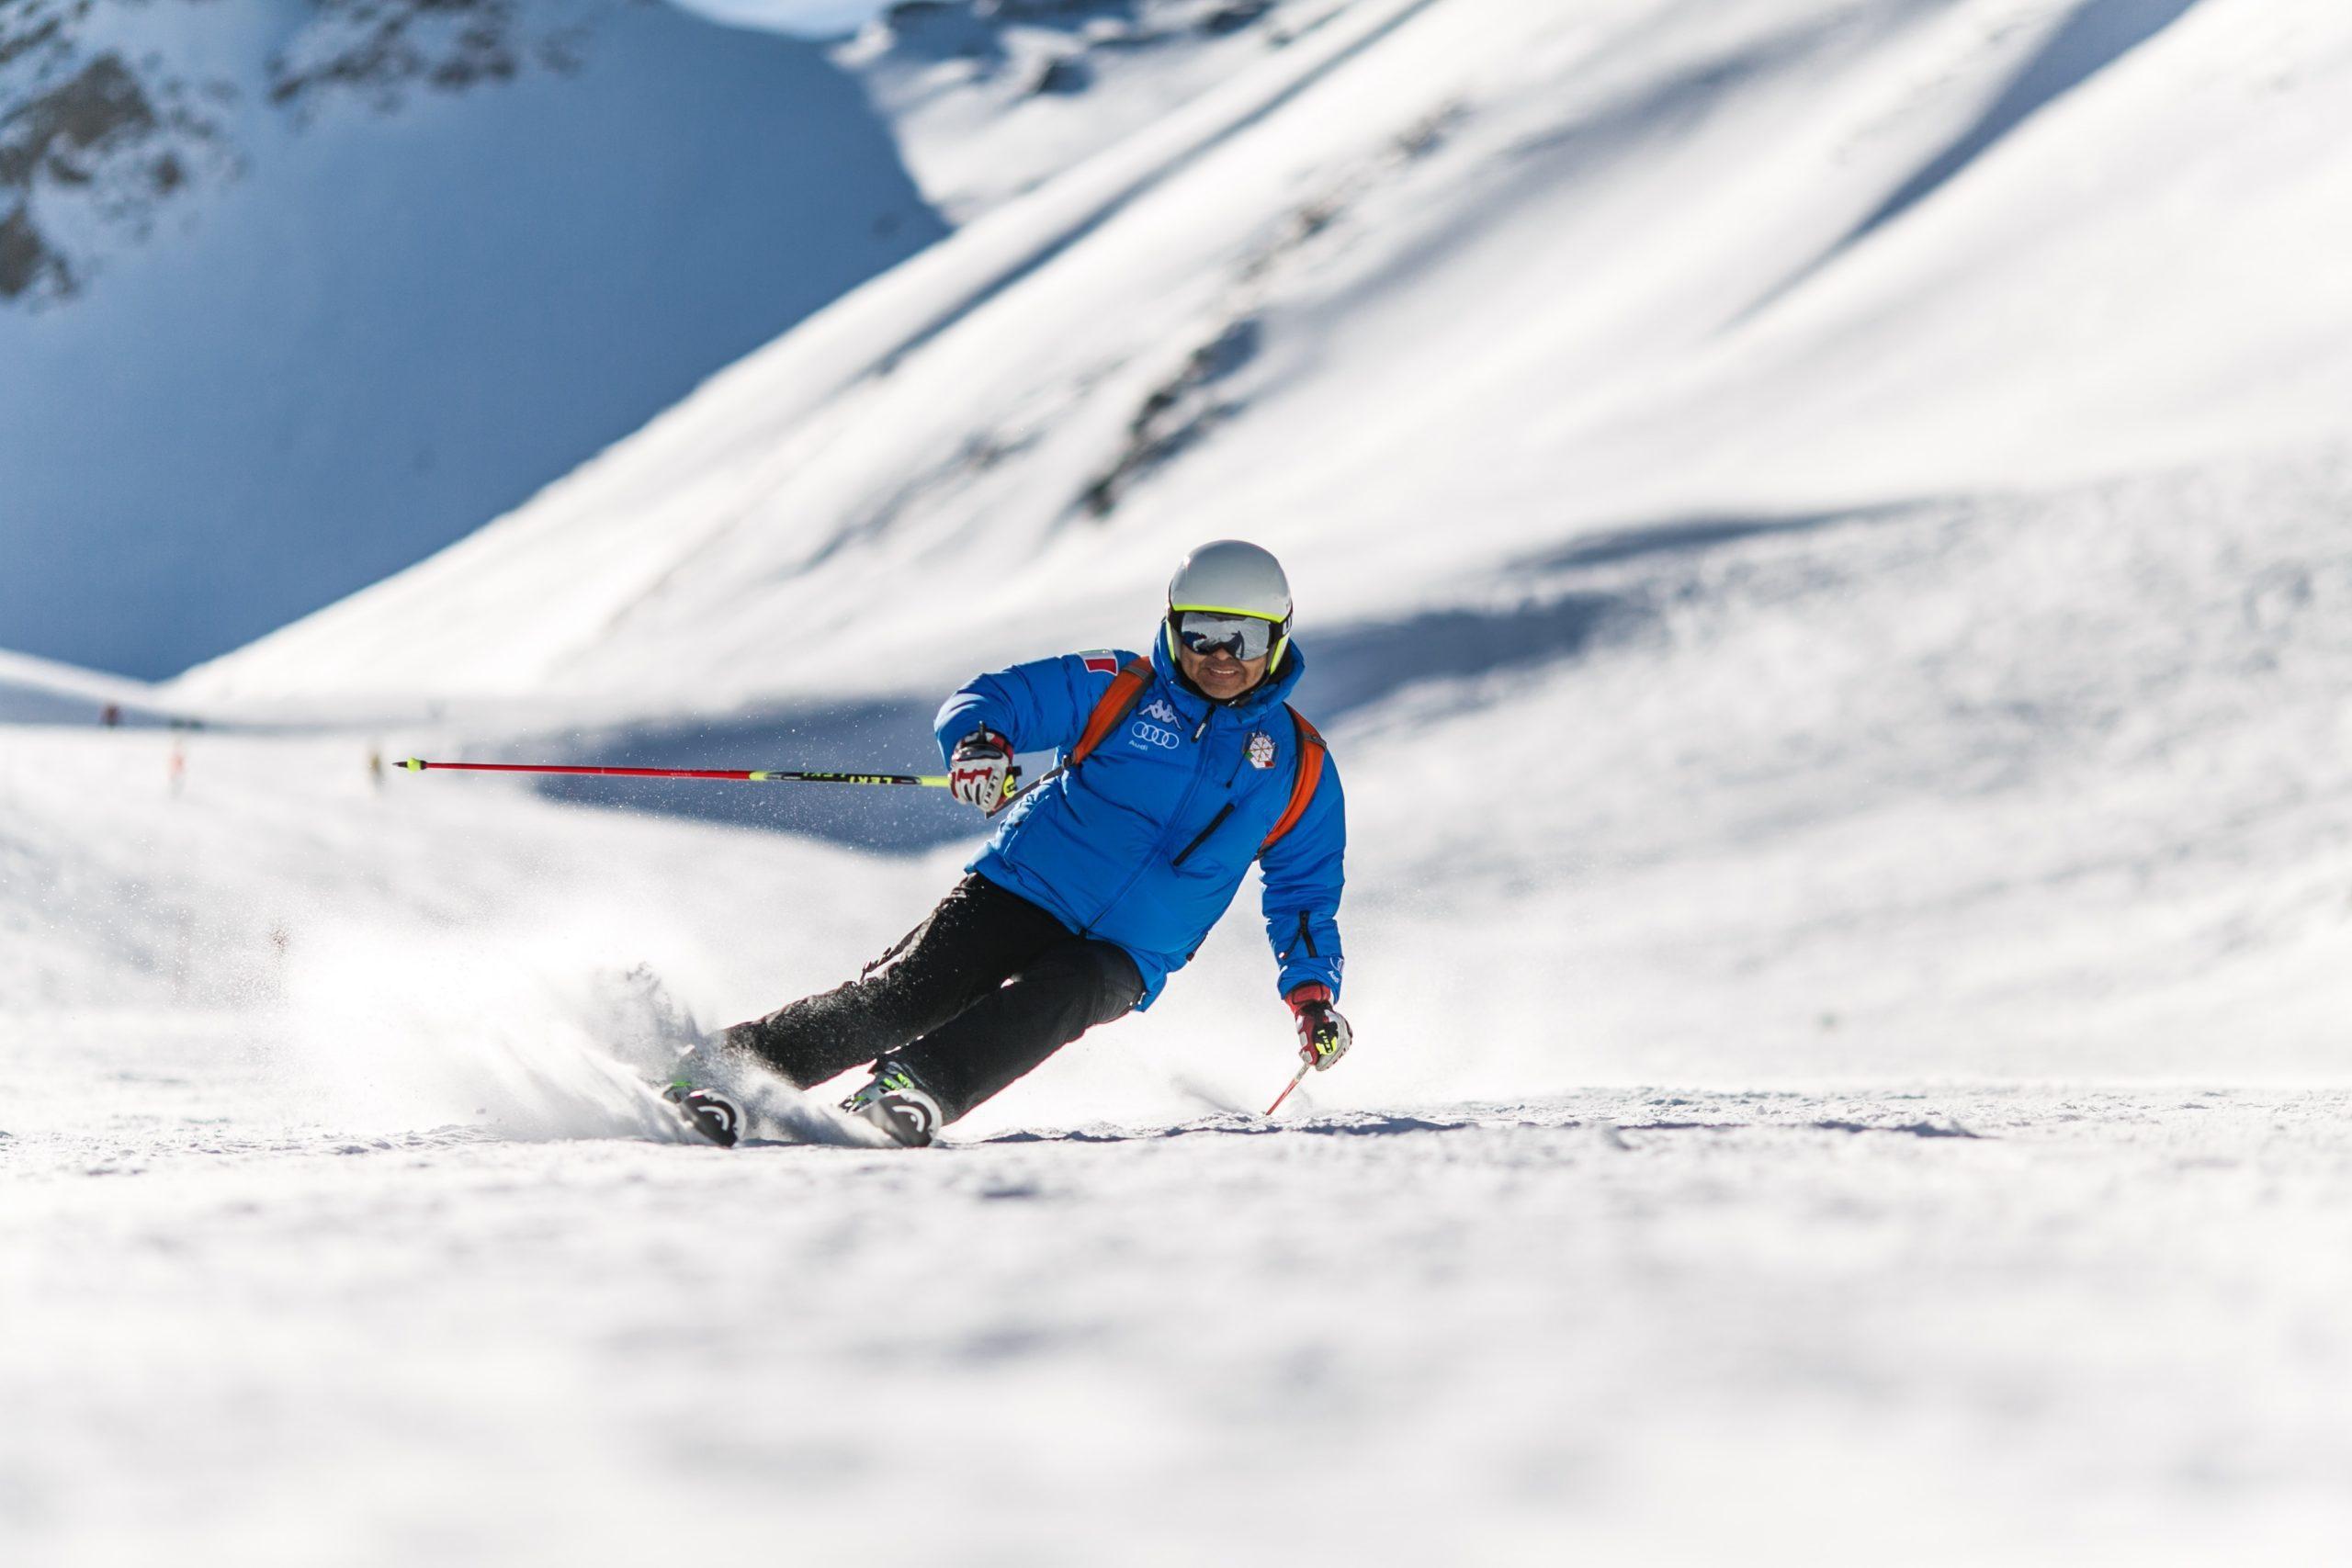 wintersport zonder blessures